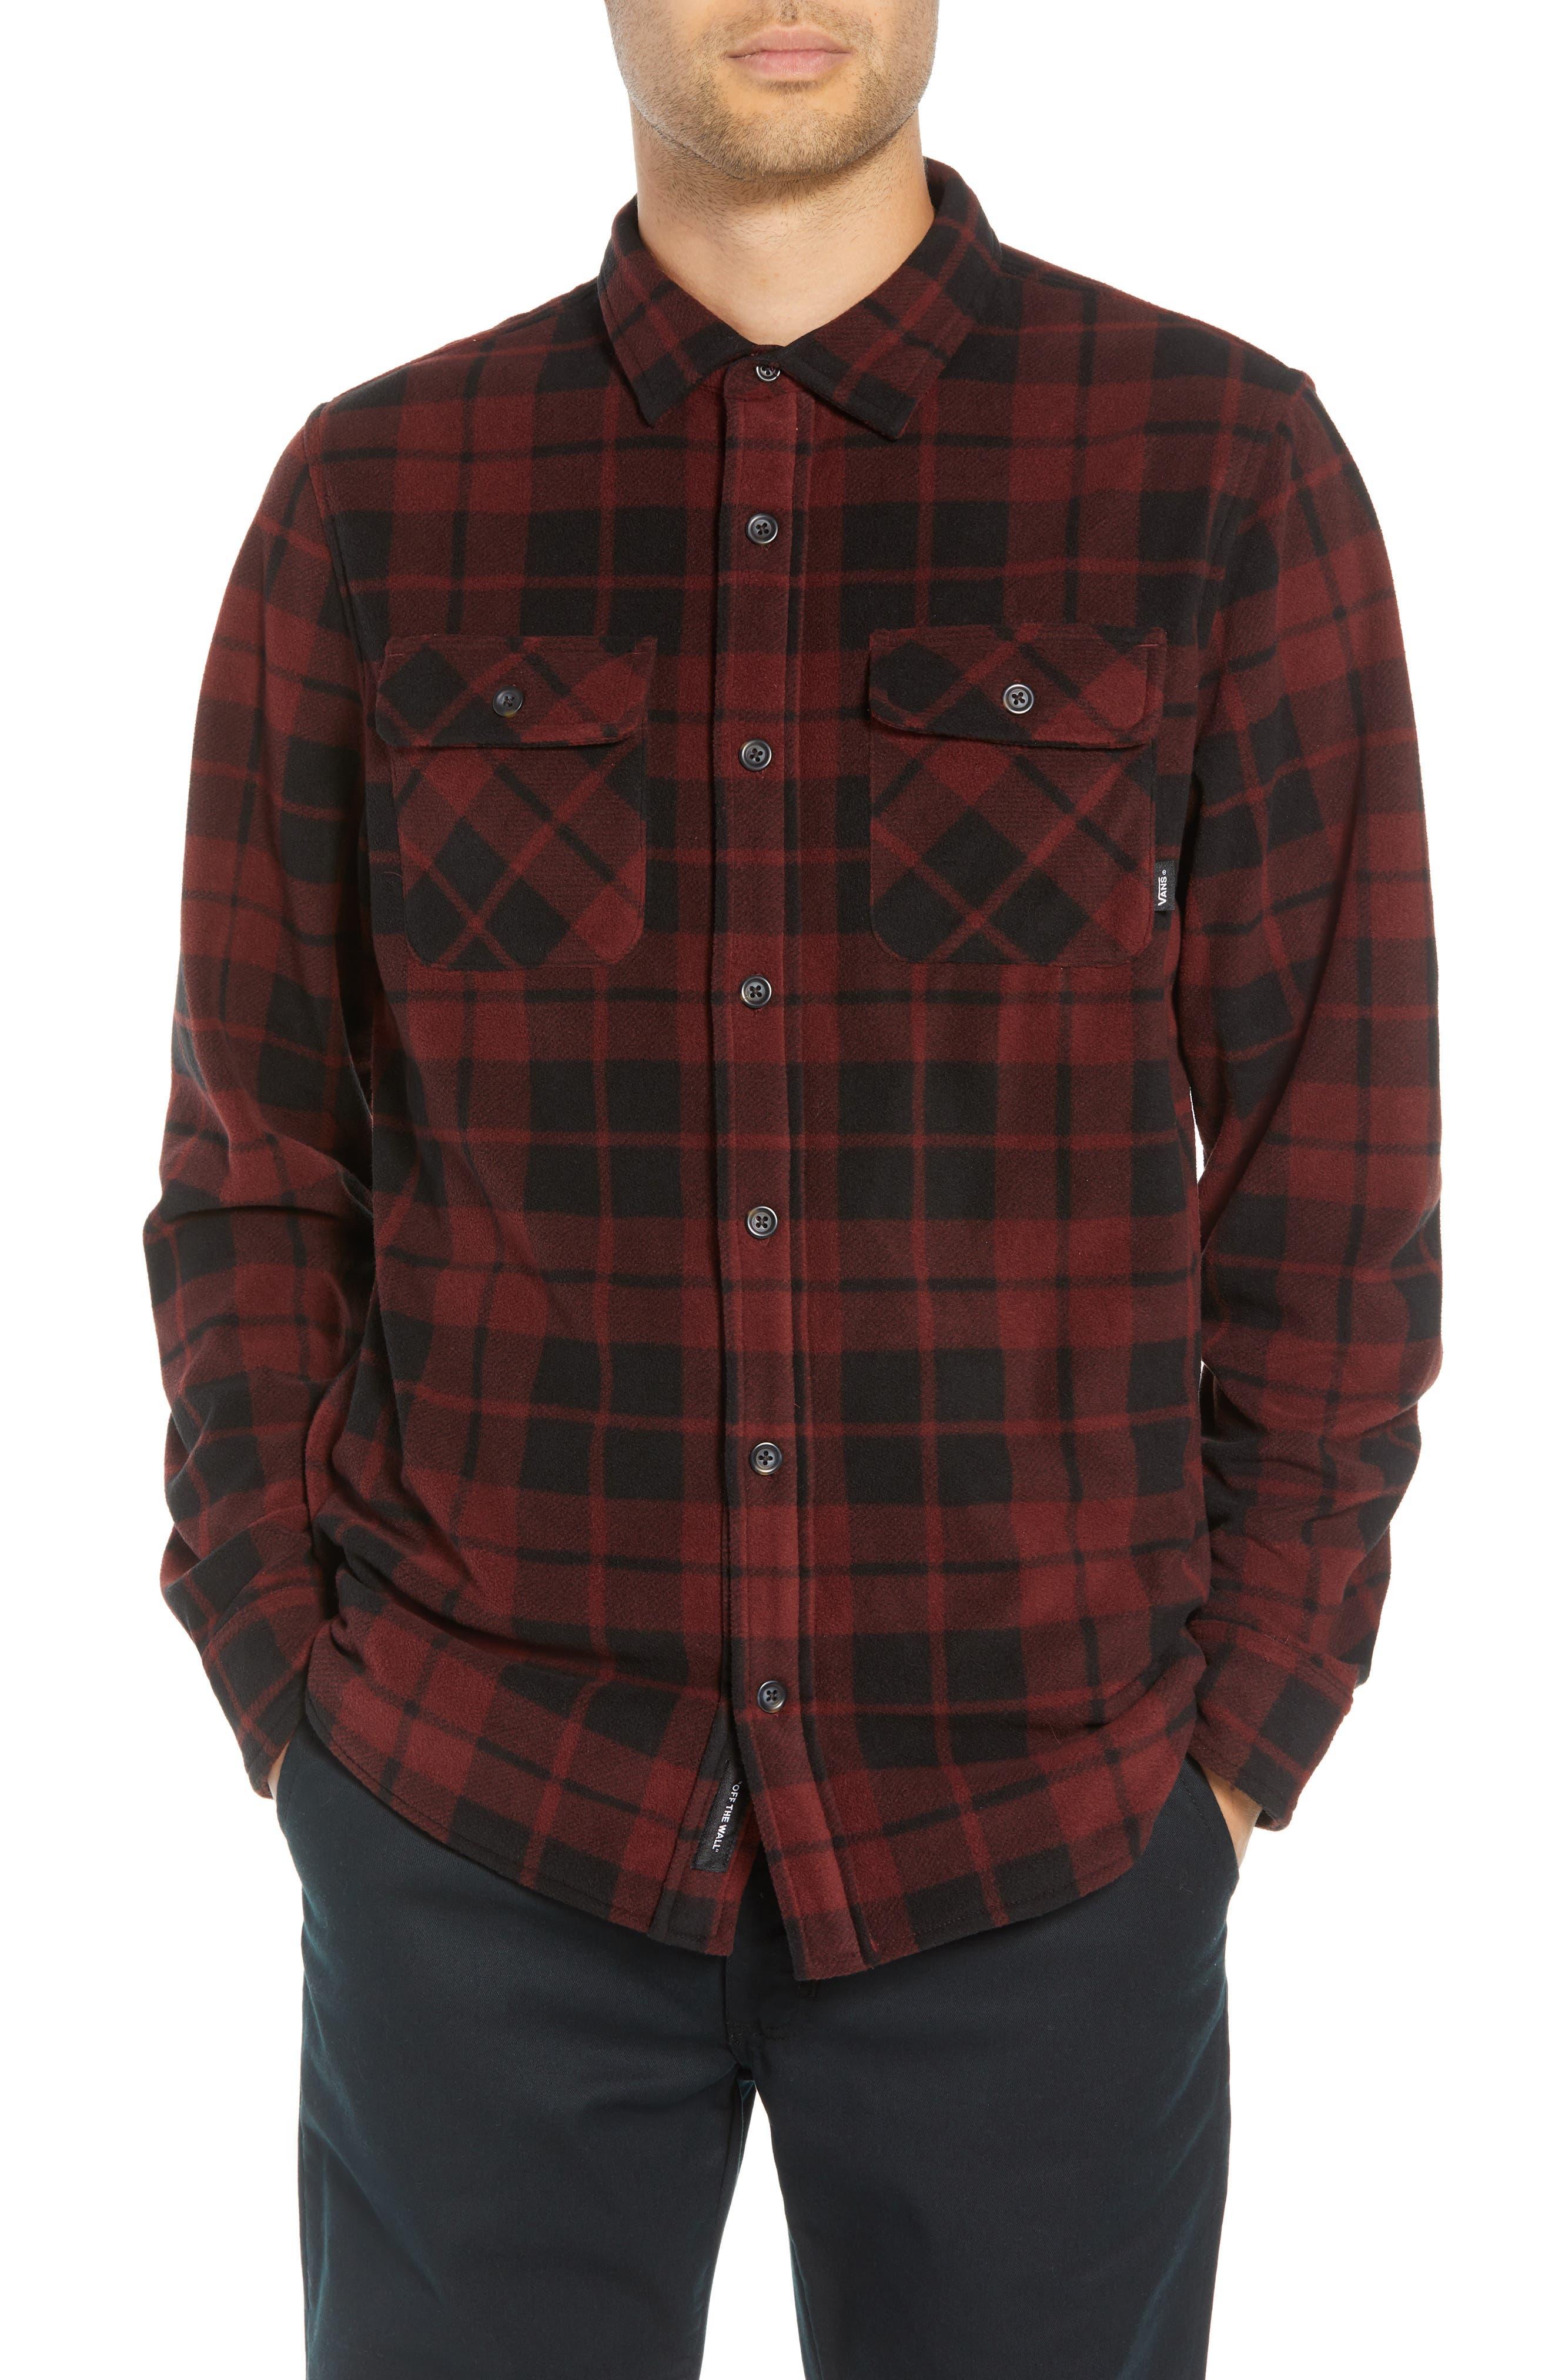 Hillcrest Fleece Shirt,                         Main,                         color, 930